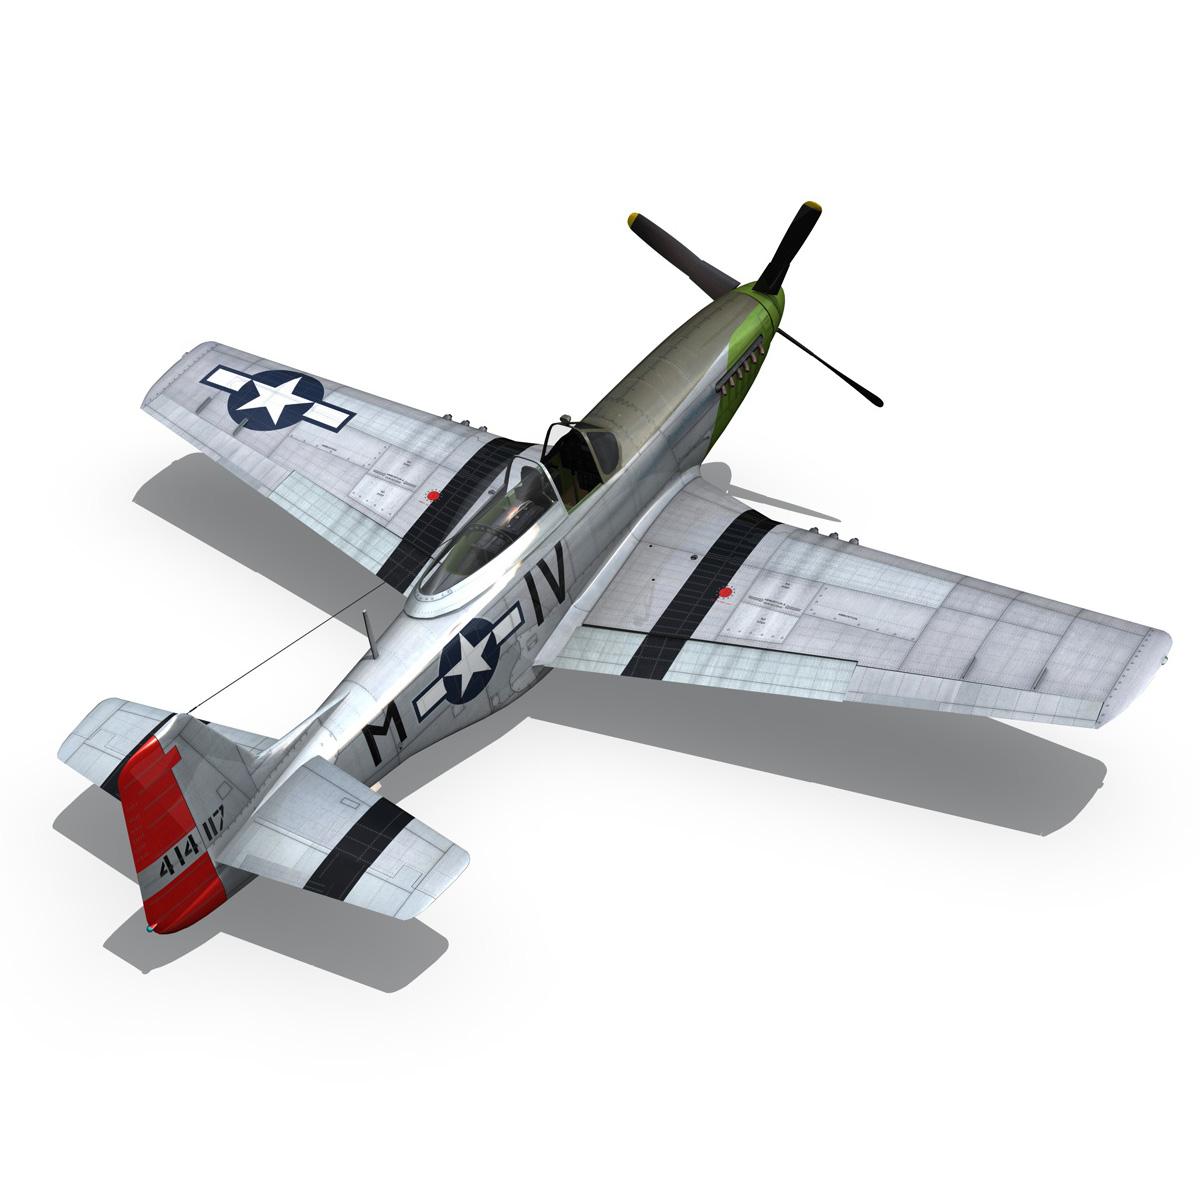 north american p-51d mustang – stinky 3d model fbx c4d lwo obj 269608